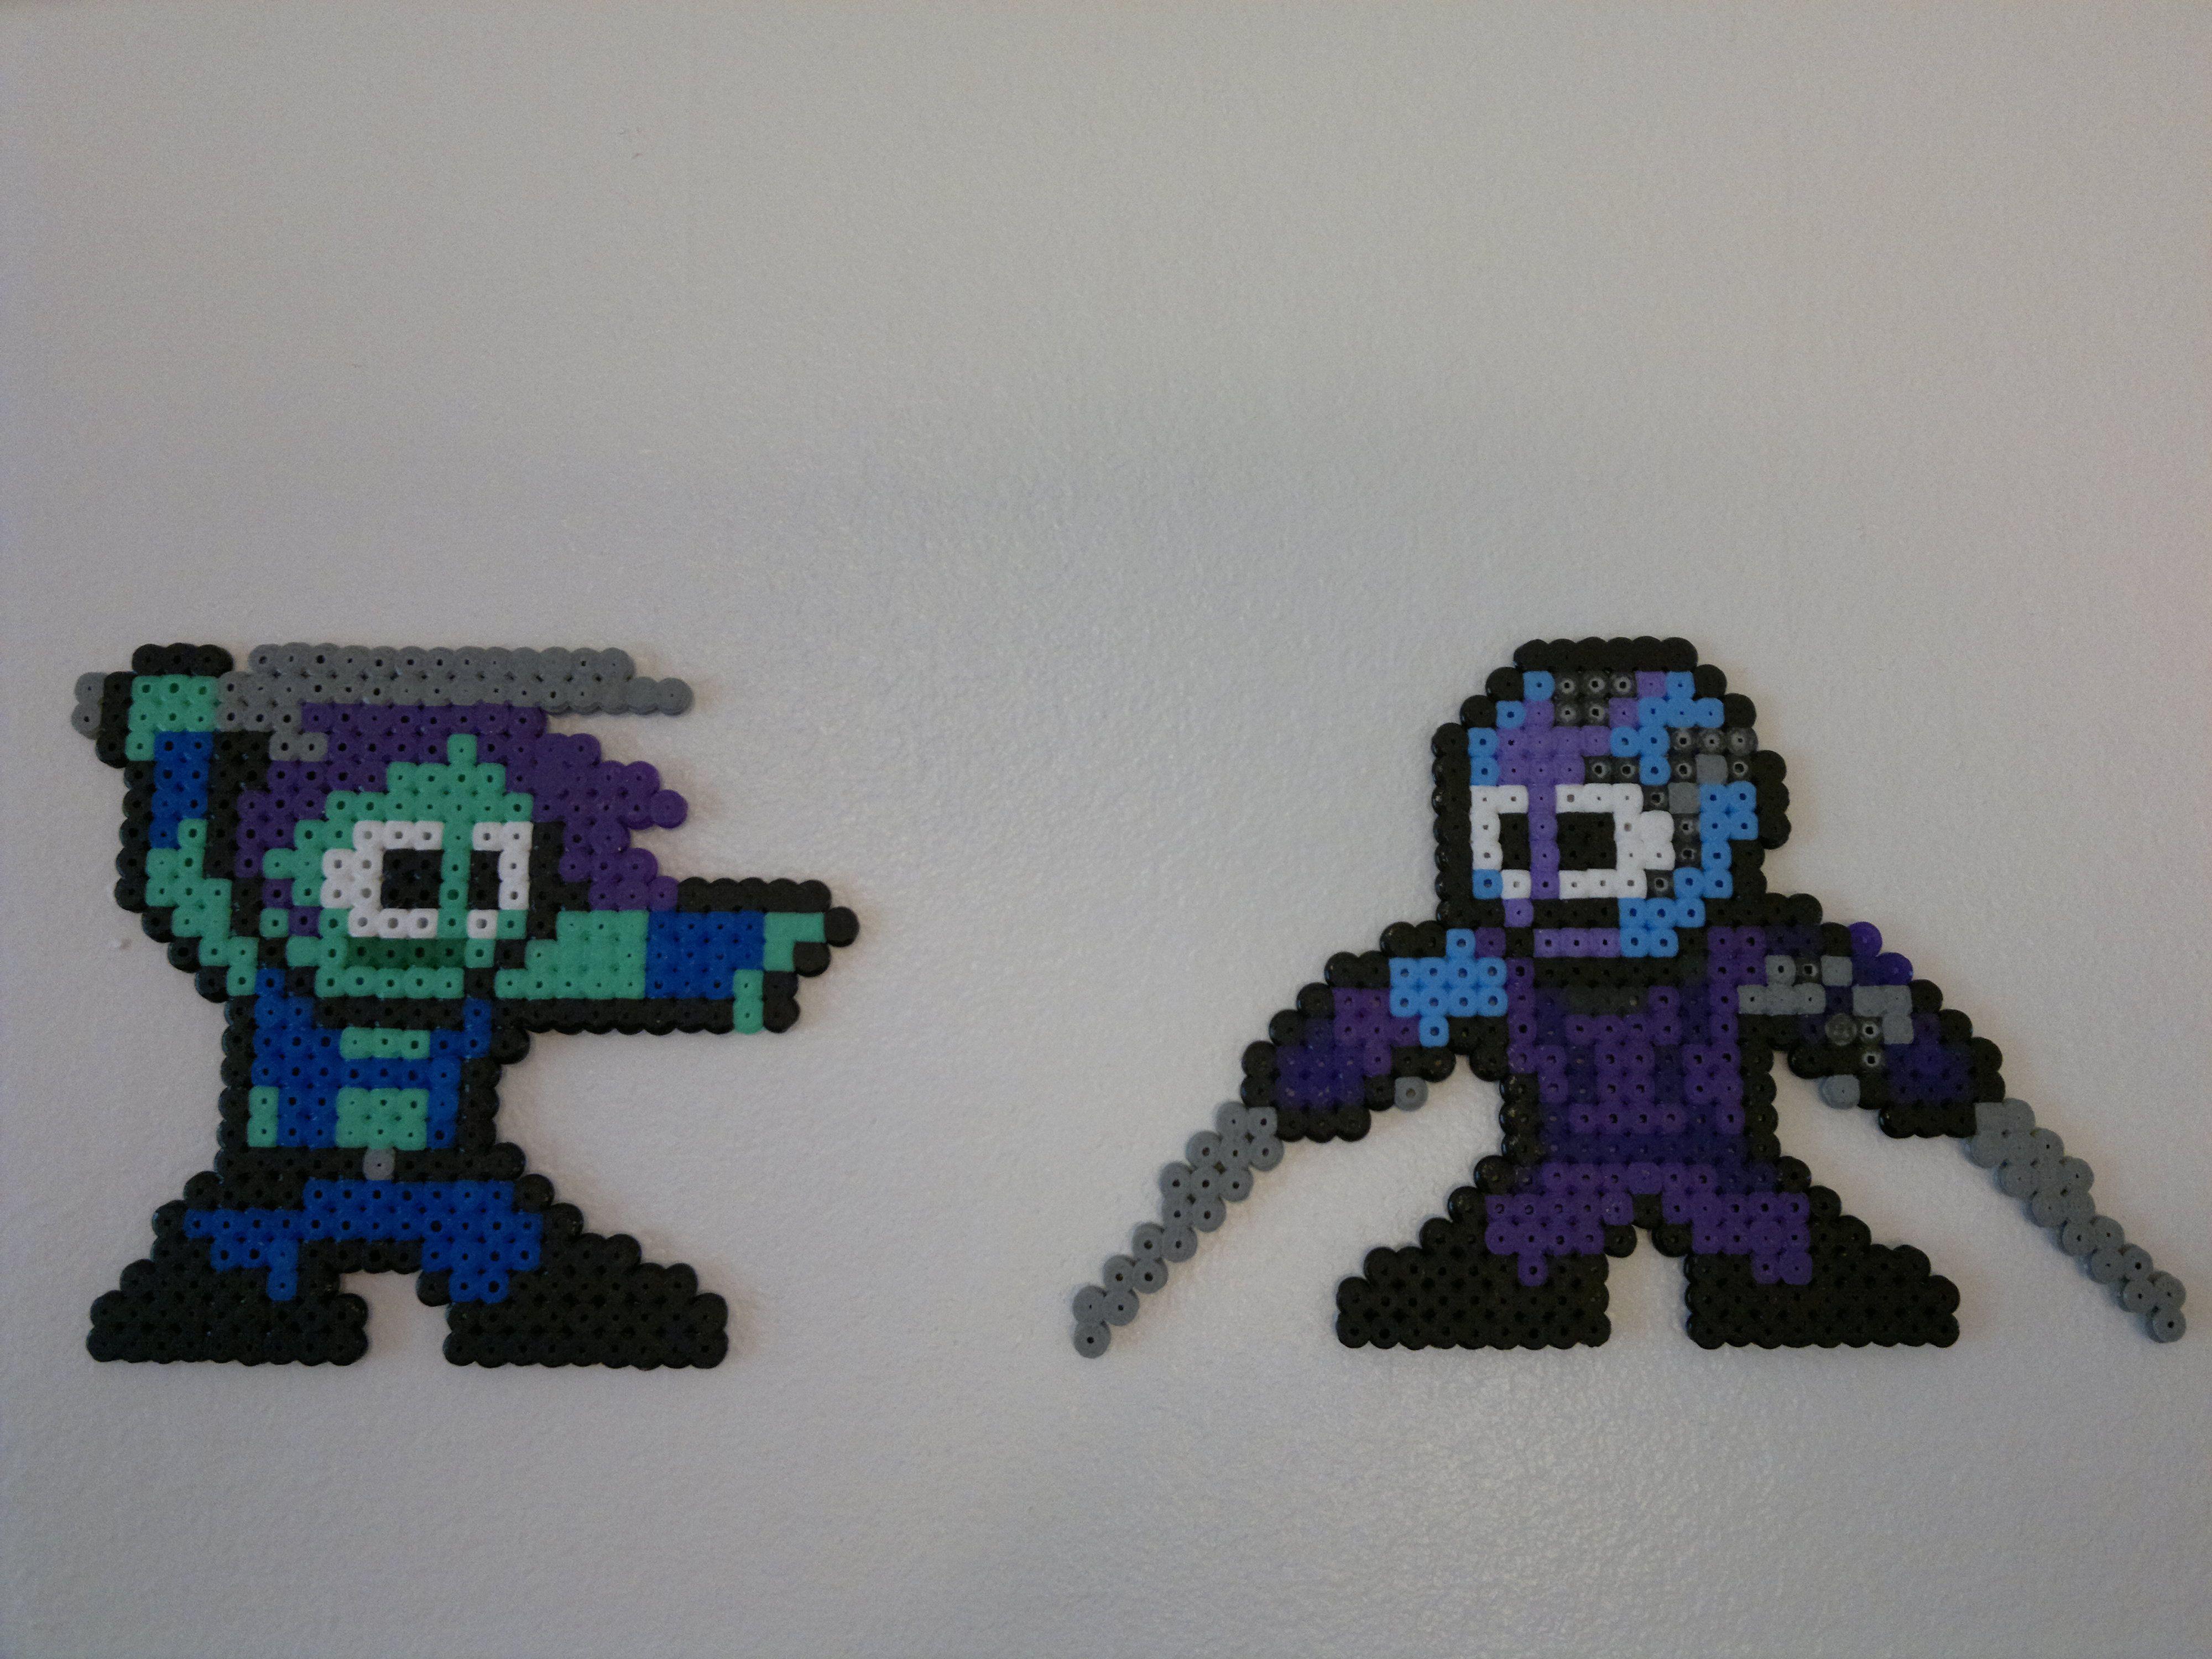 Guardians of the Galaxy - Gamora vs Nebula